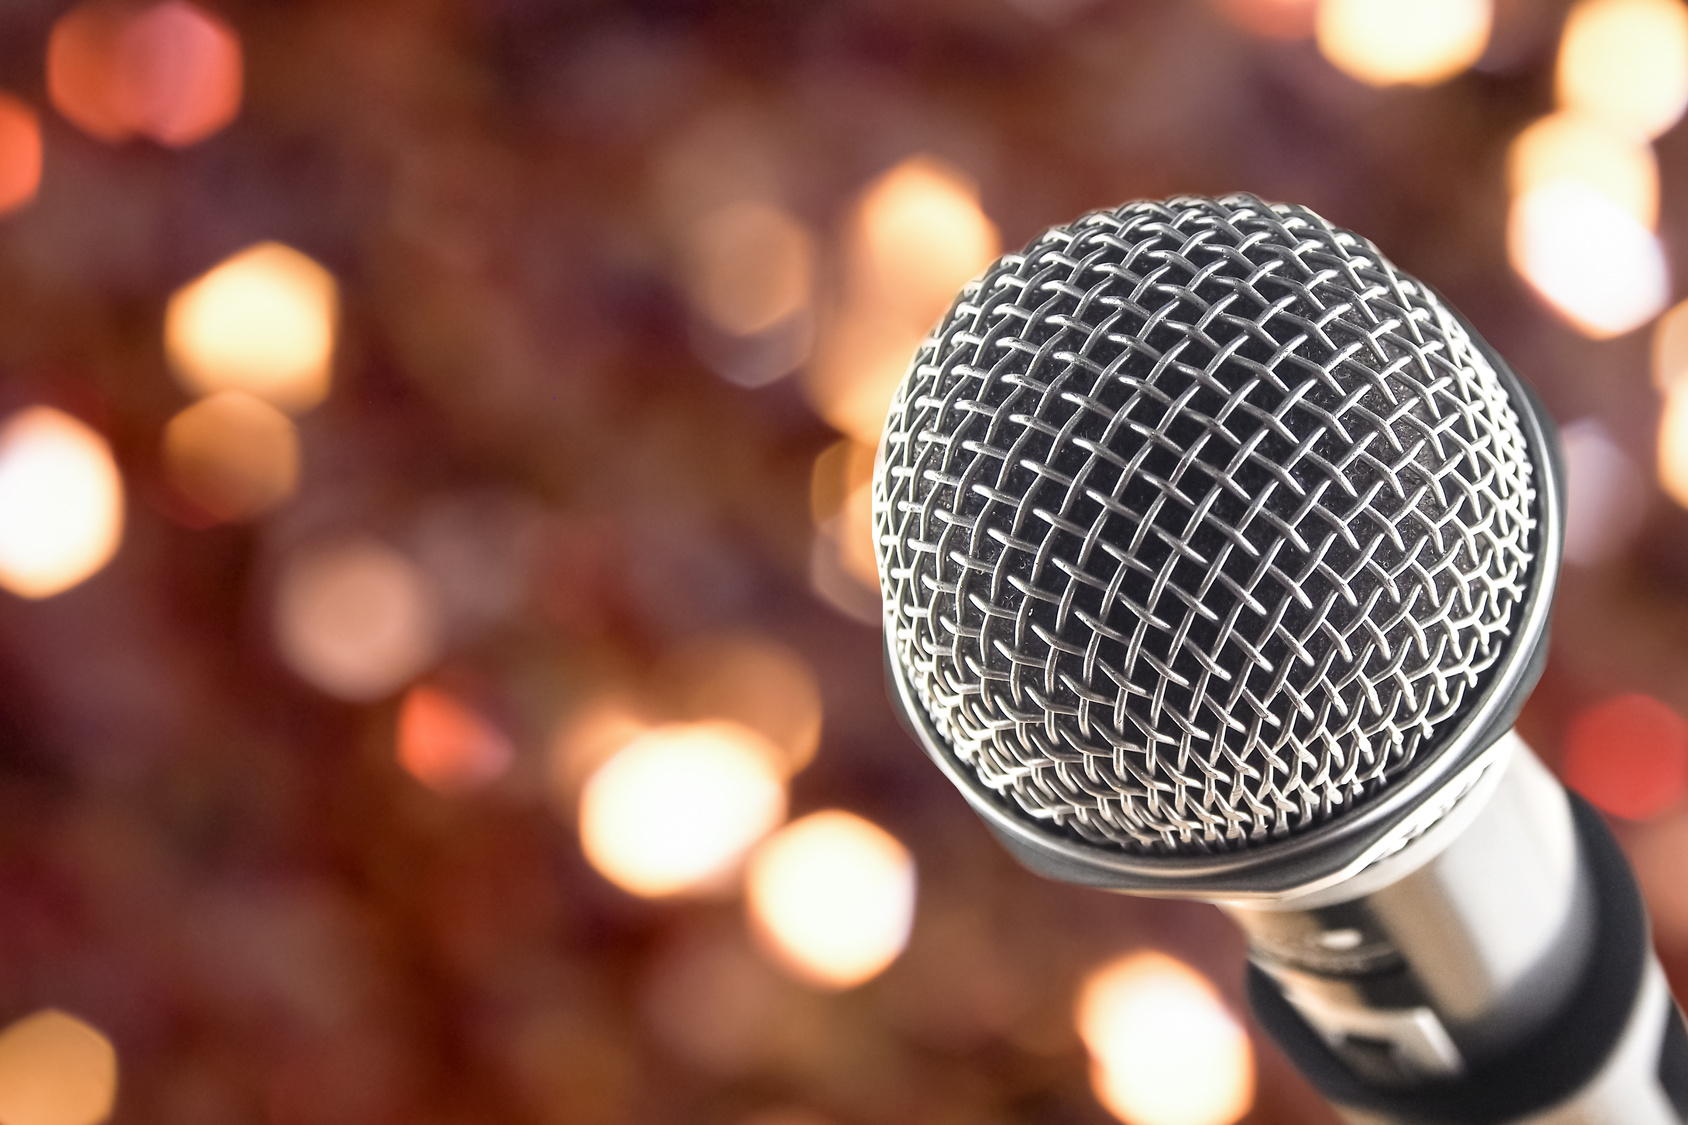 Microphone fotolia.jpg